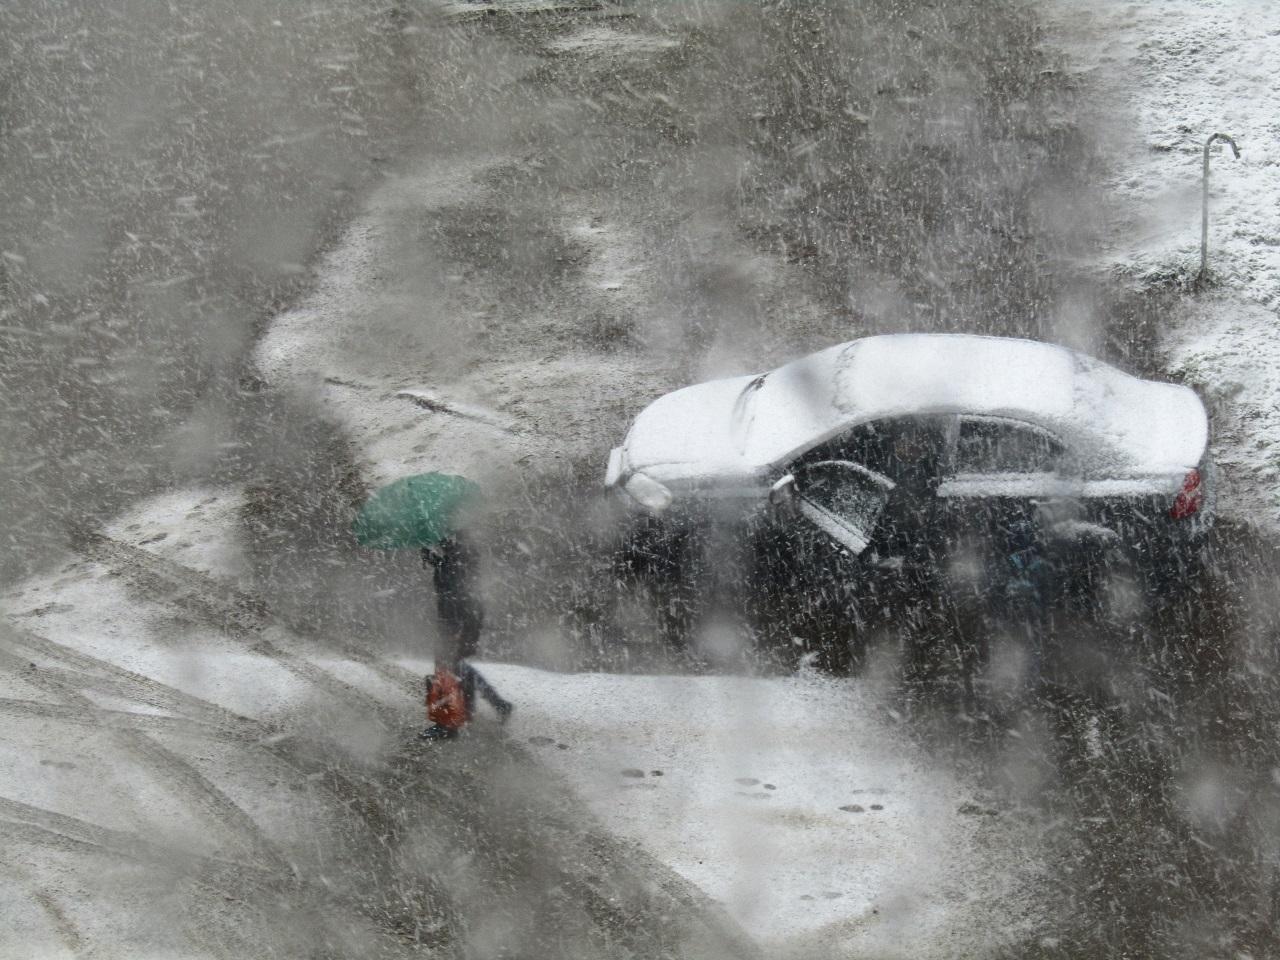 Под зонтом. Картина снегом.